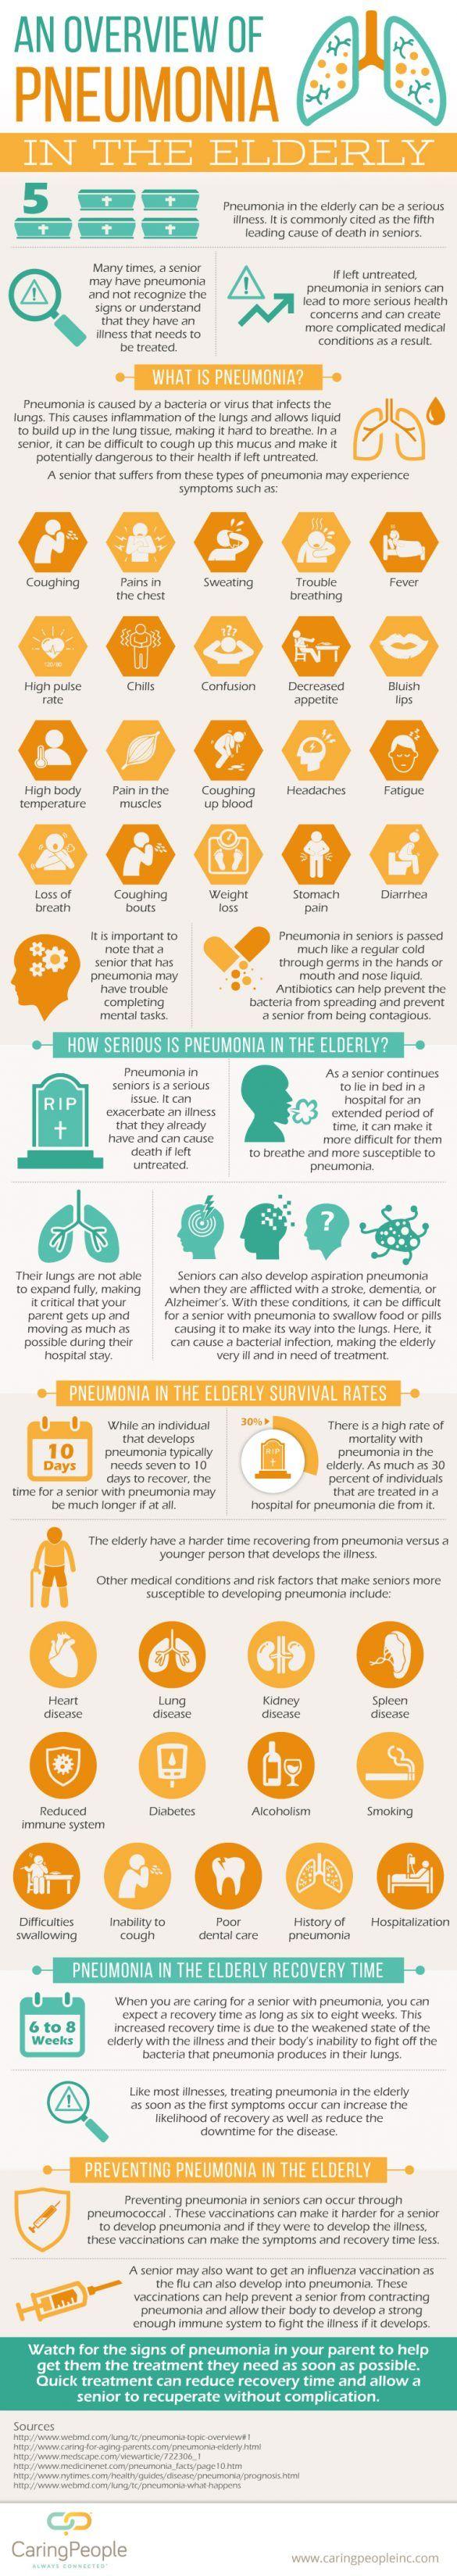 Pneumonia In The Elderly Infographic